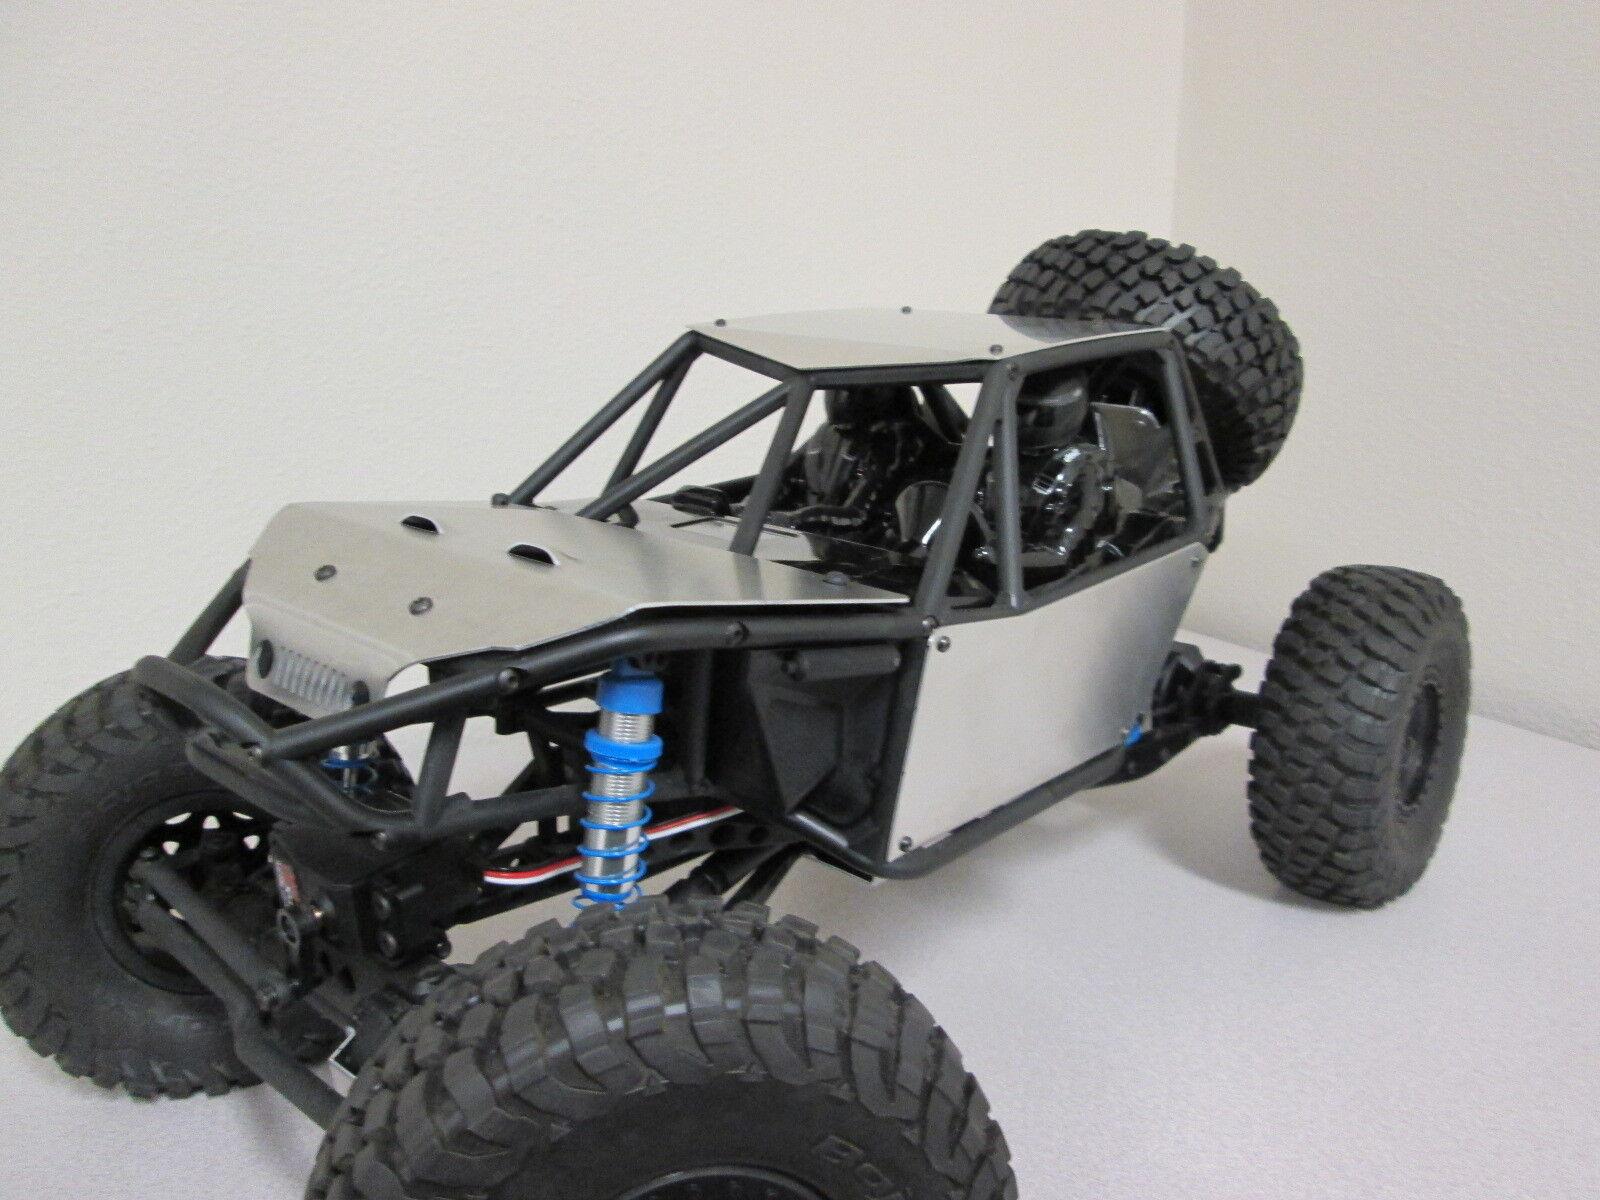 Axial Bomber RR10 Deluxe PANEL de cuerpo de aluminio Kit